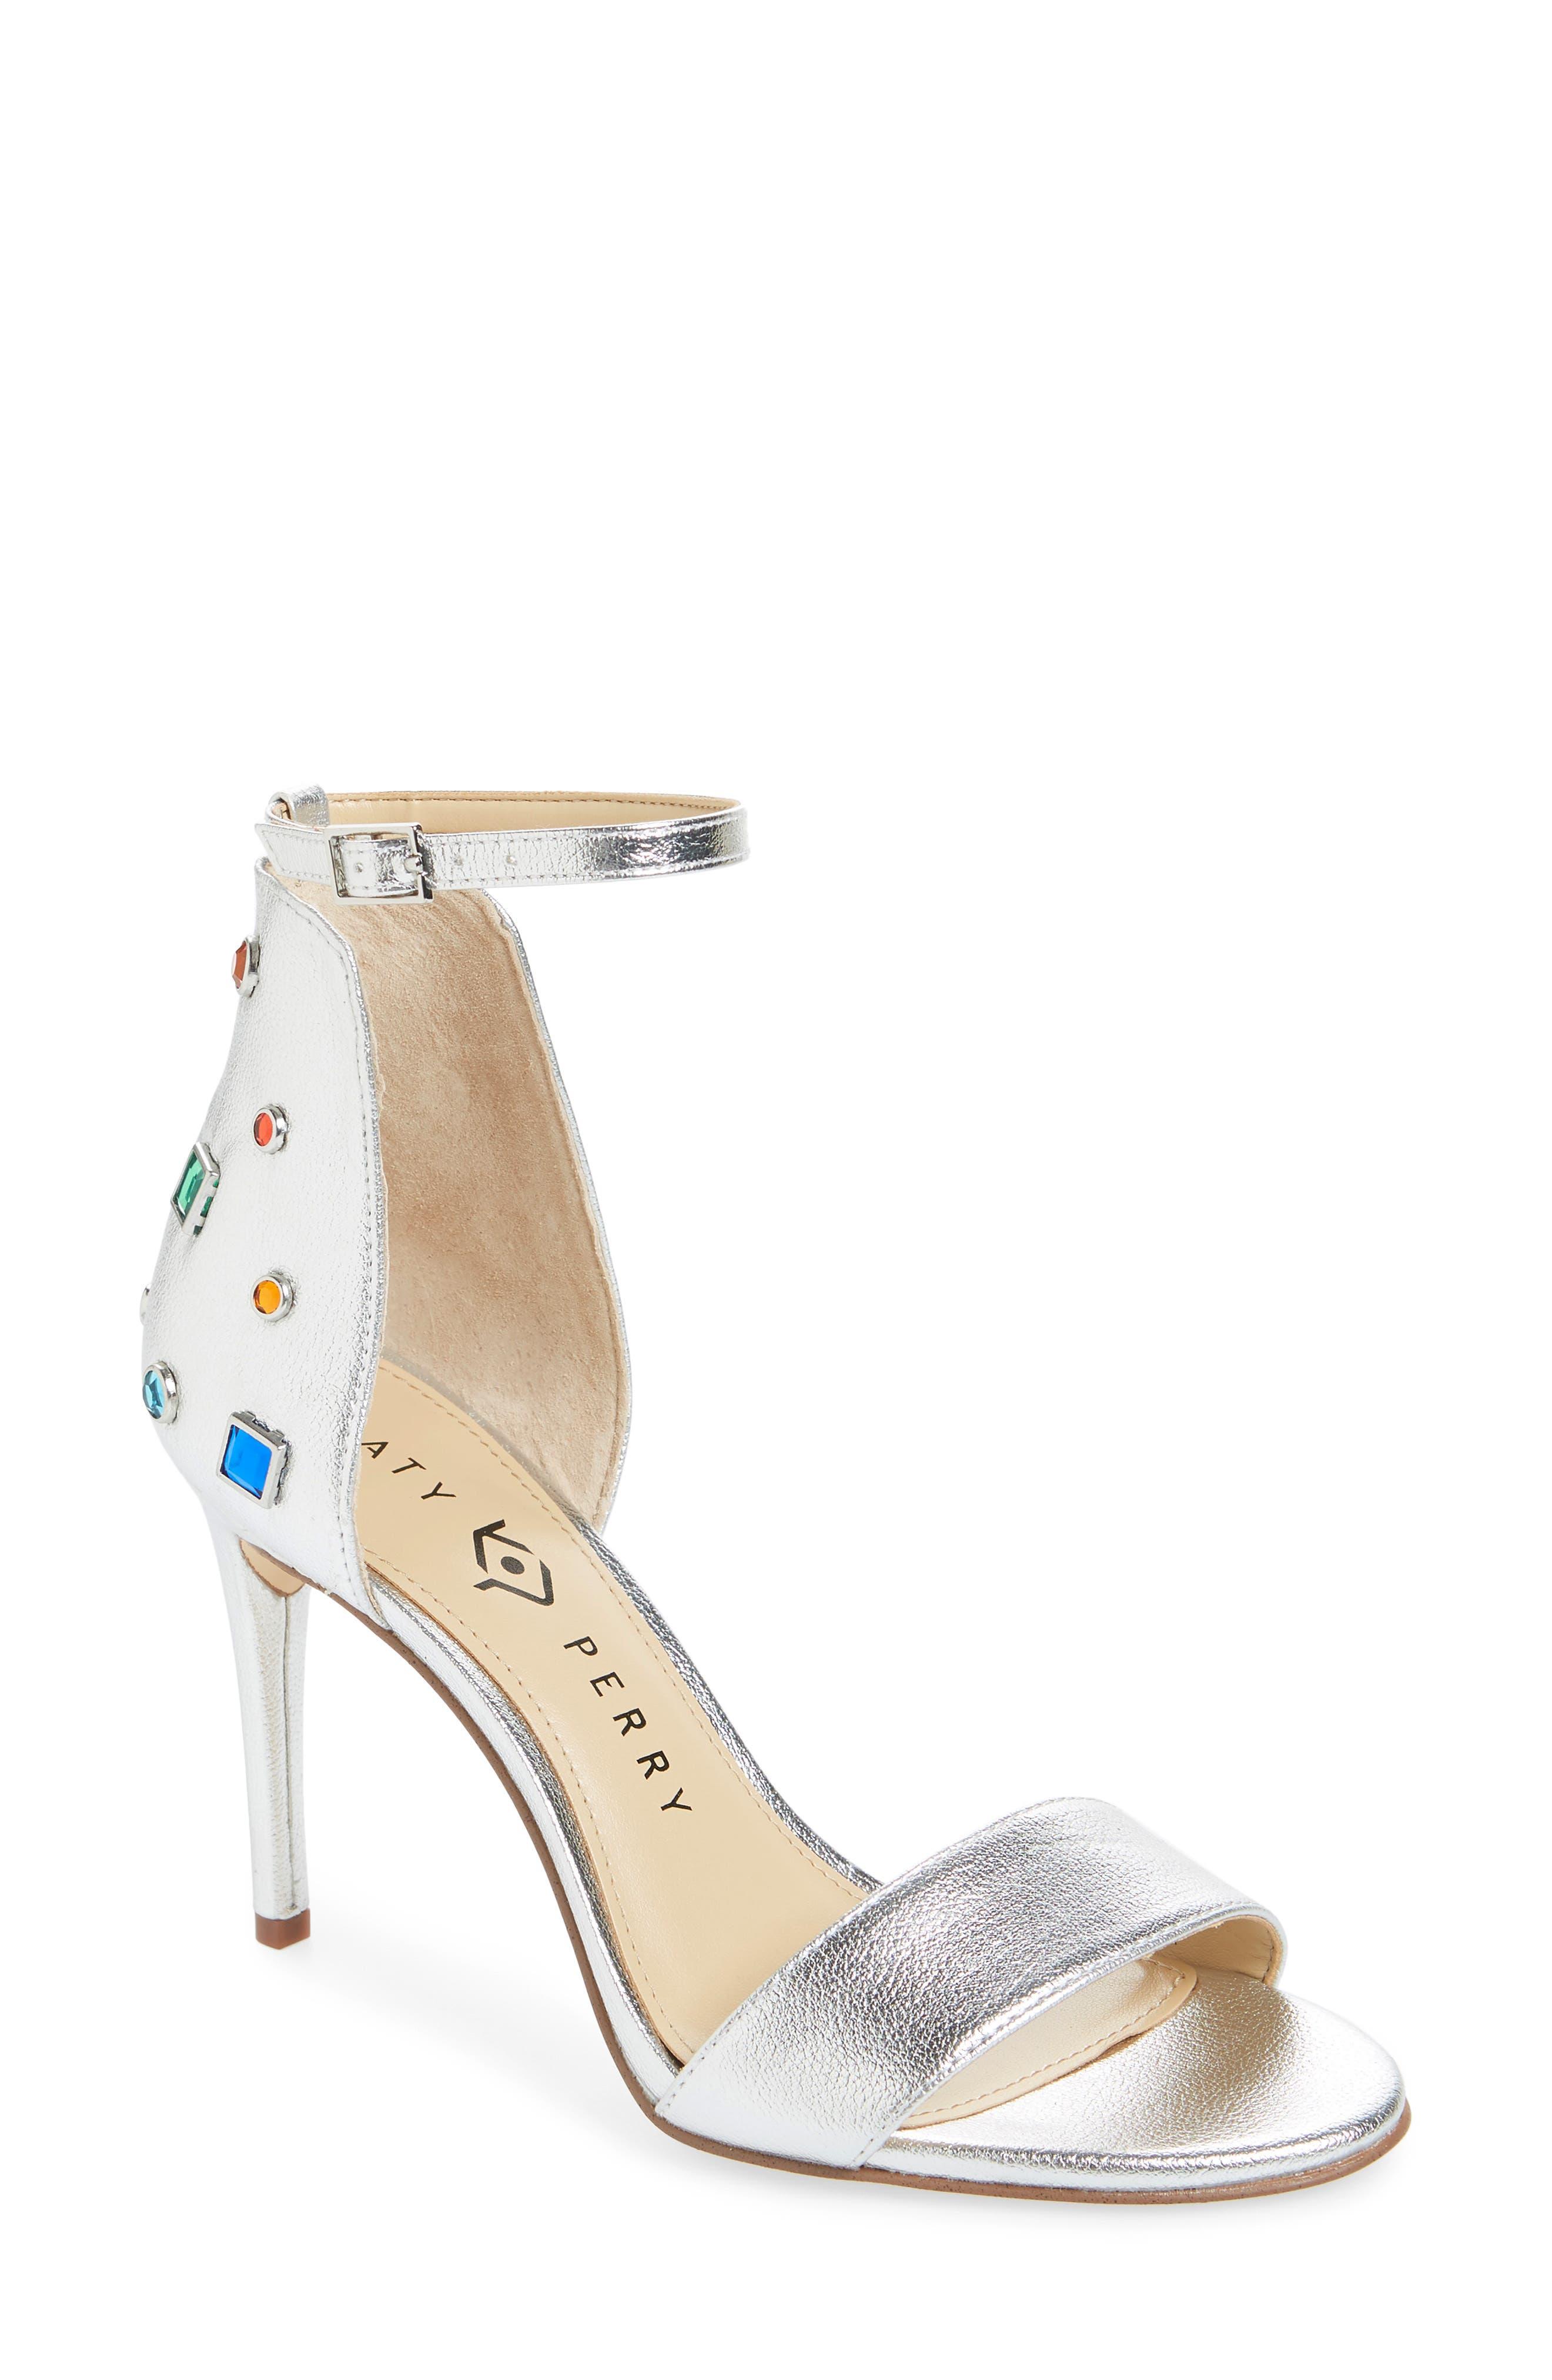 Katy Perry Jewel Ankle Strap Sandal, Metallic